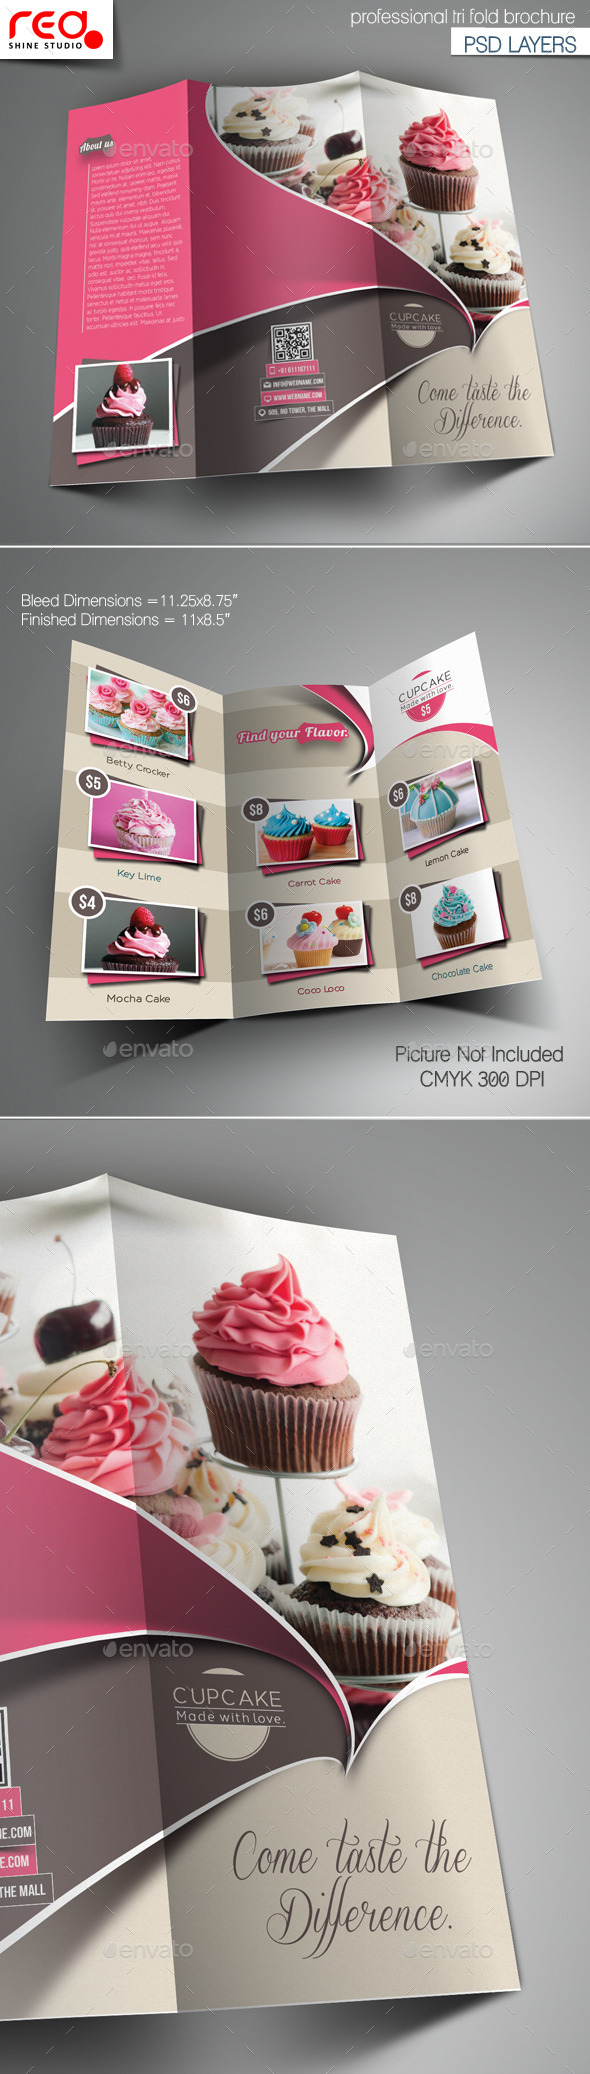 Cupcake Trifold Brochure Template - Brochures Print Templates